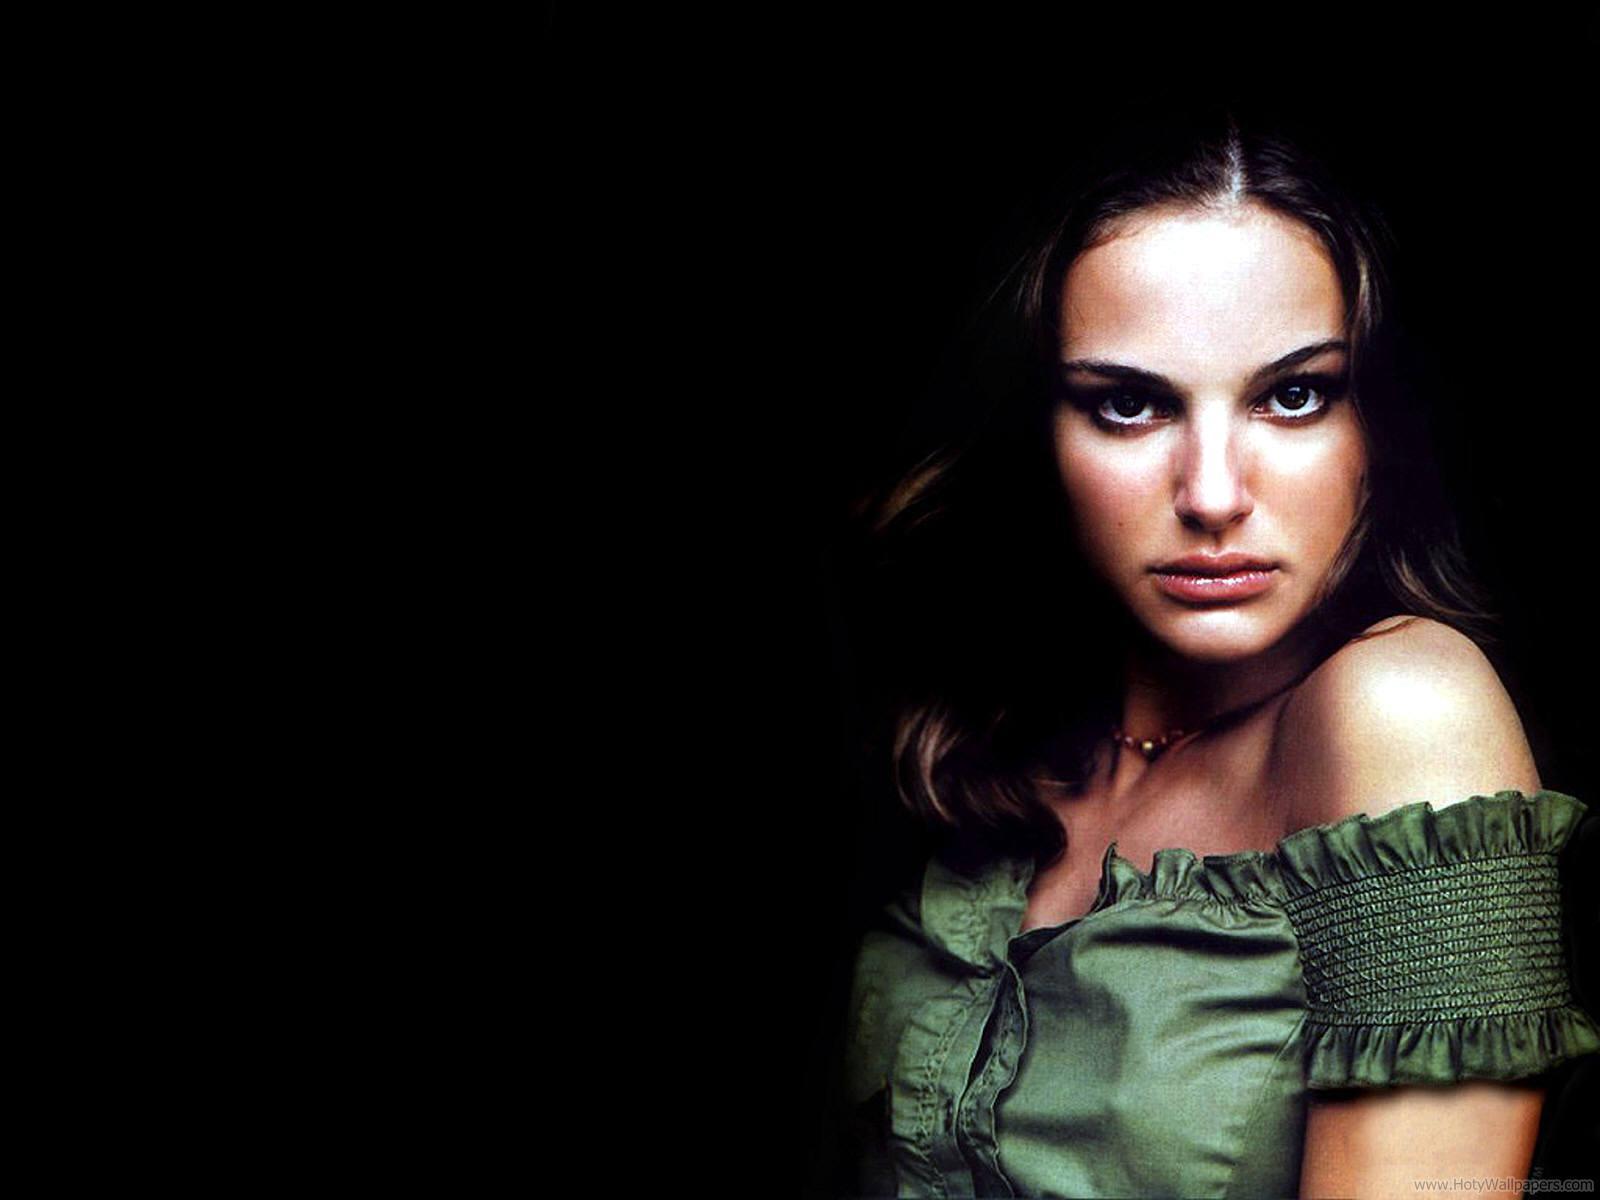 Natalie Portman Hollywood Wallpapers: Natalie Portman Pretty Wallpapers